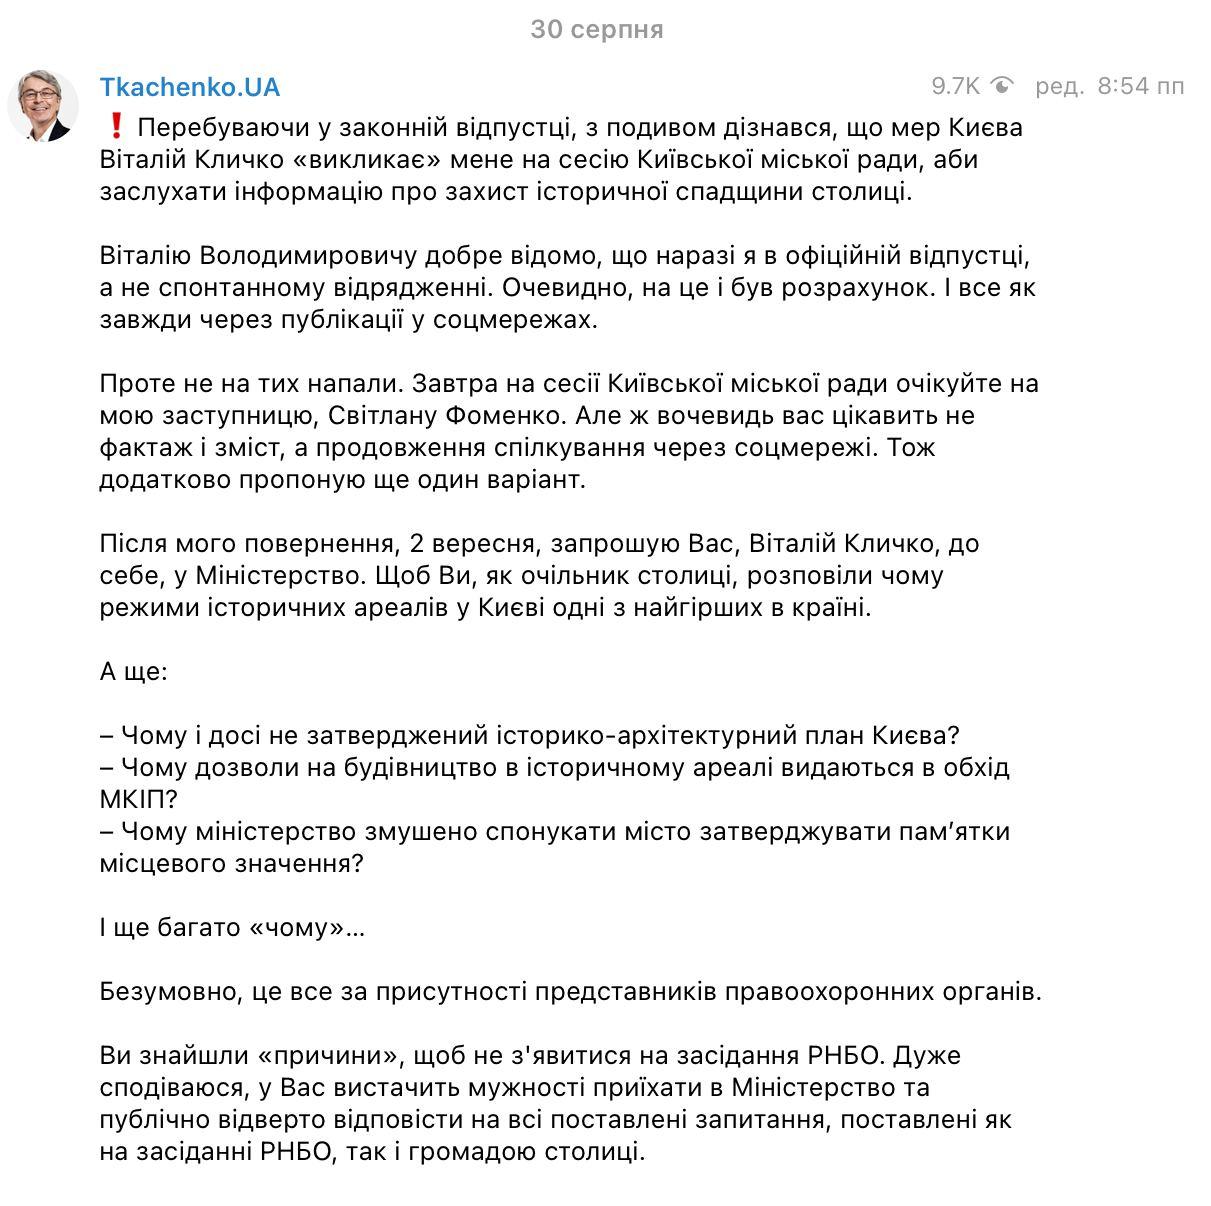 Пост Олександра Ткаченка